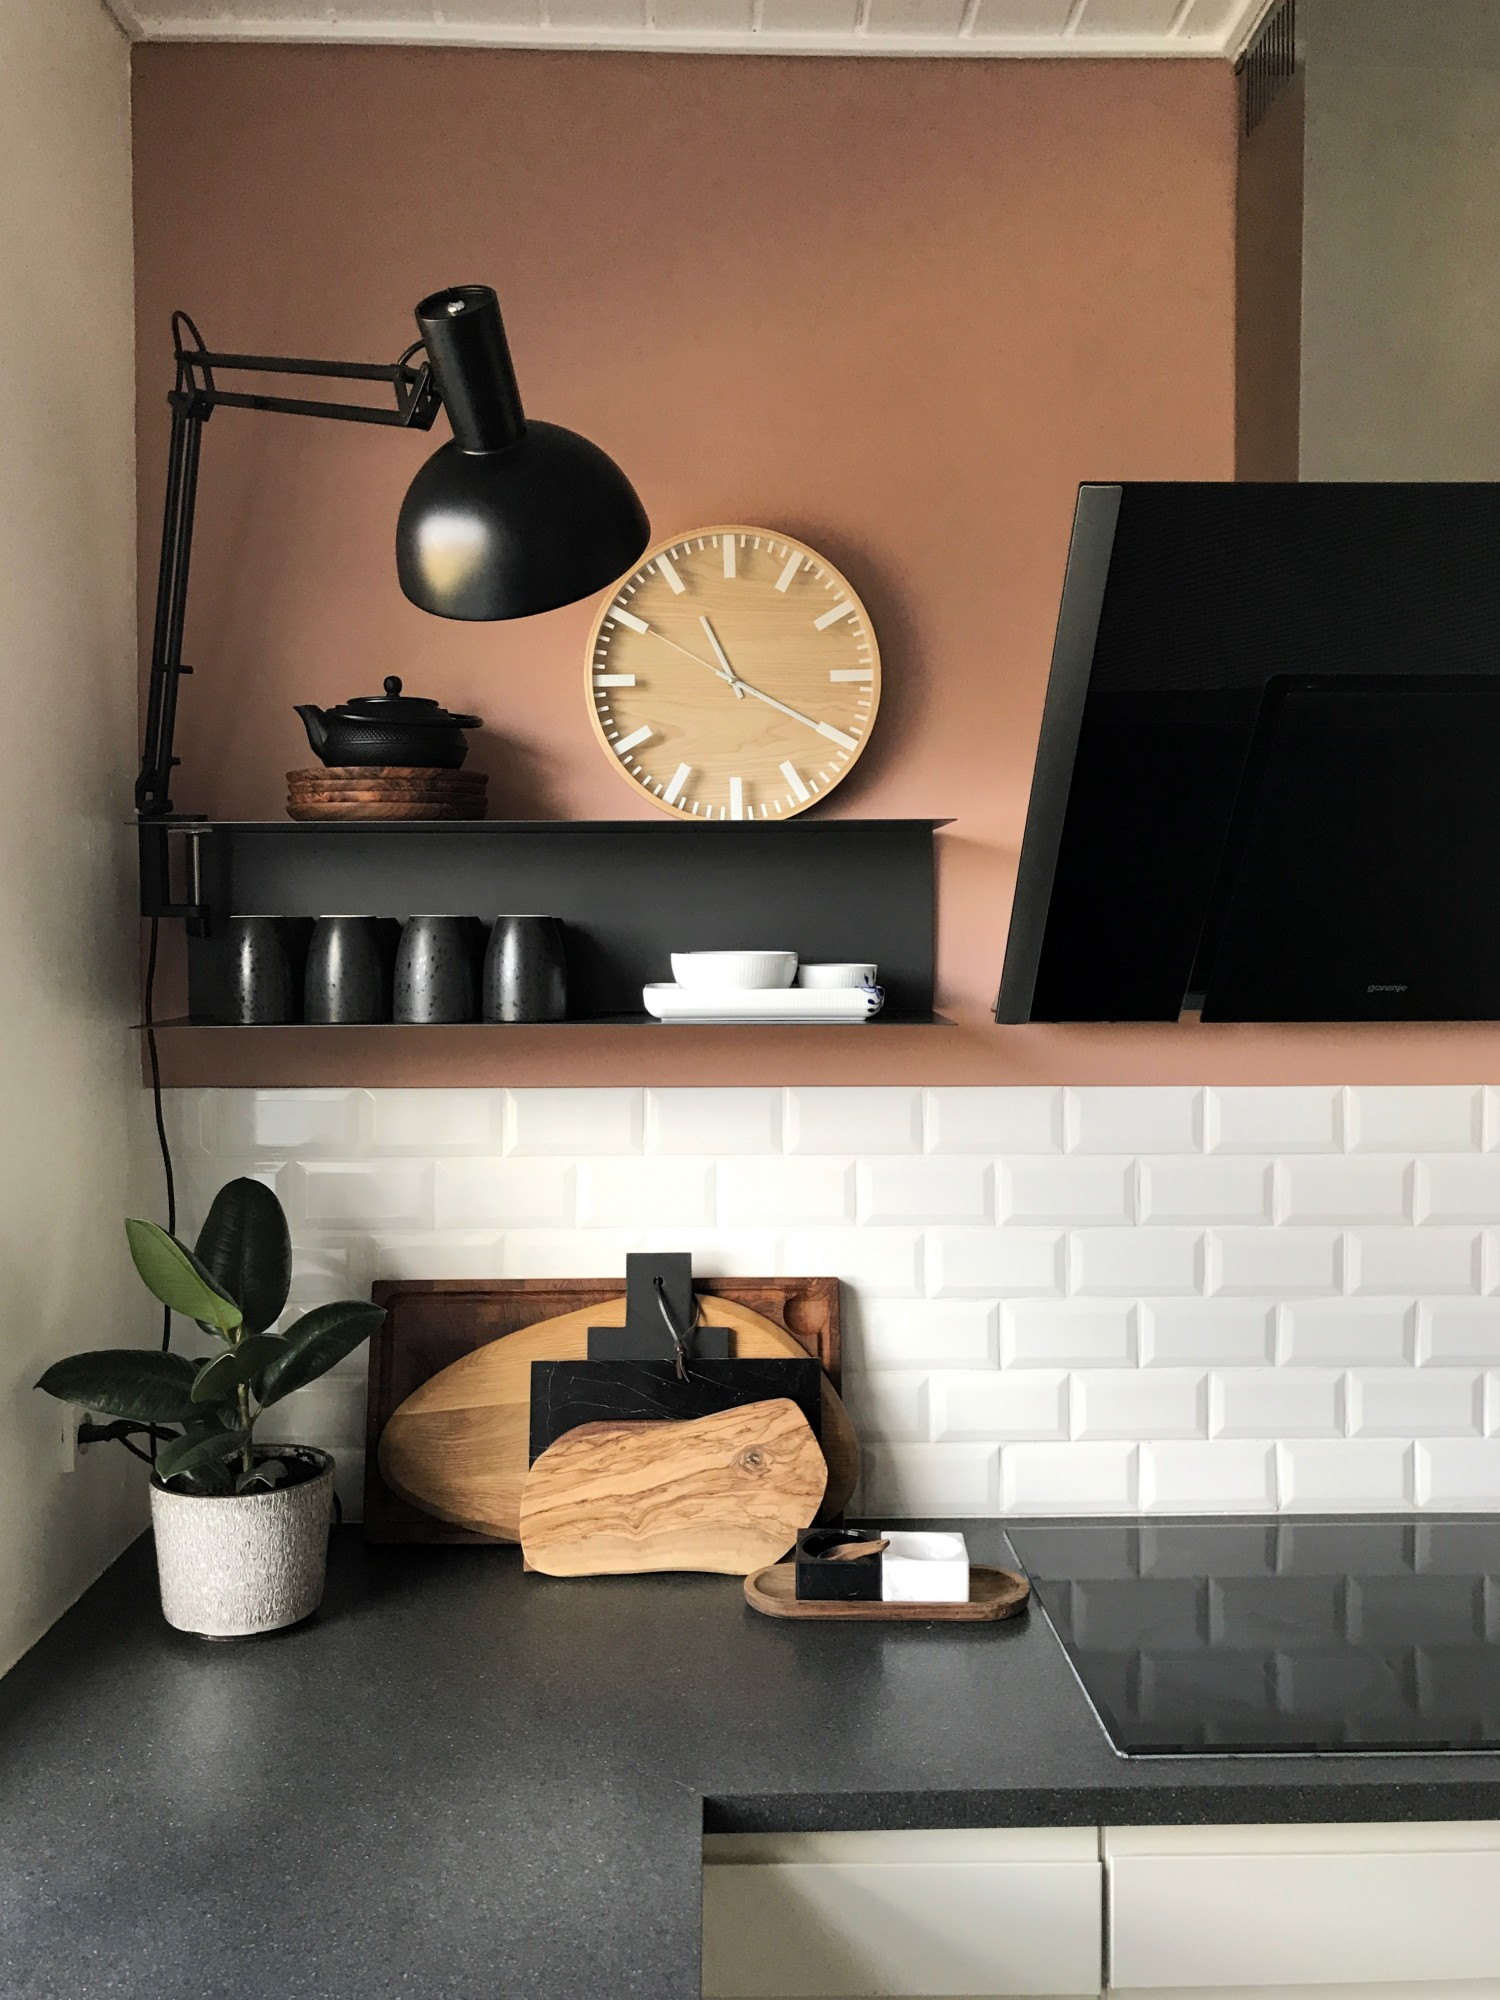 Køkkenet malet med en varm farve